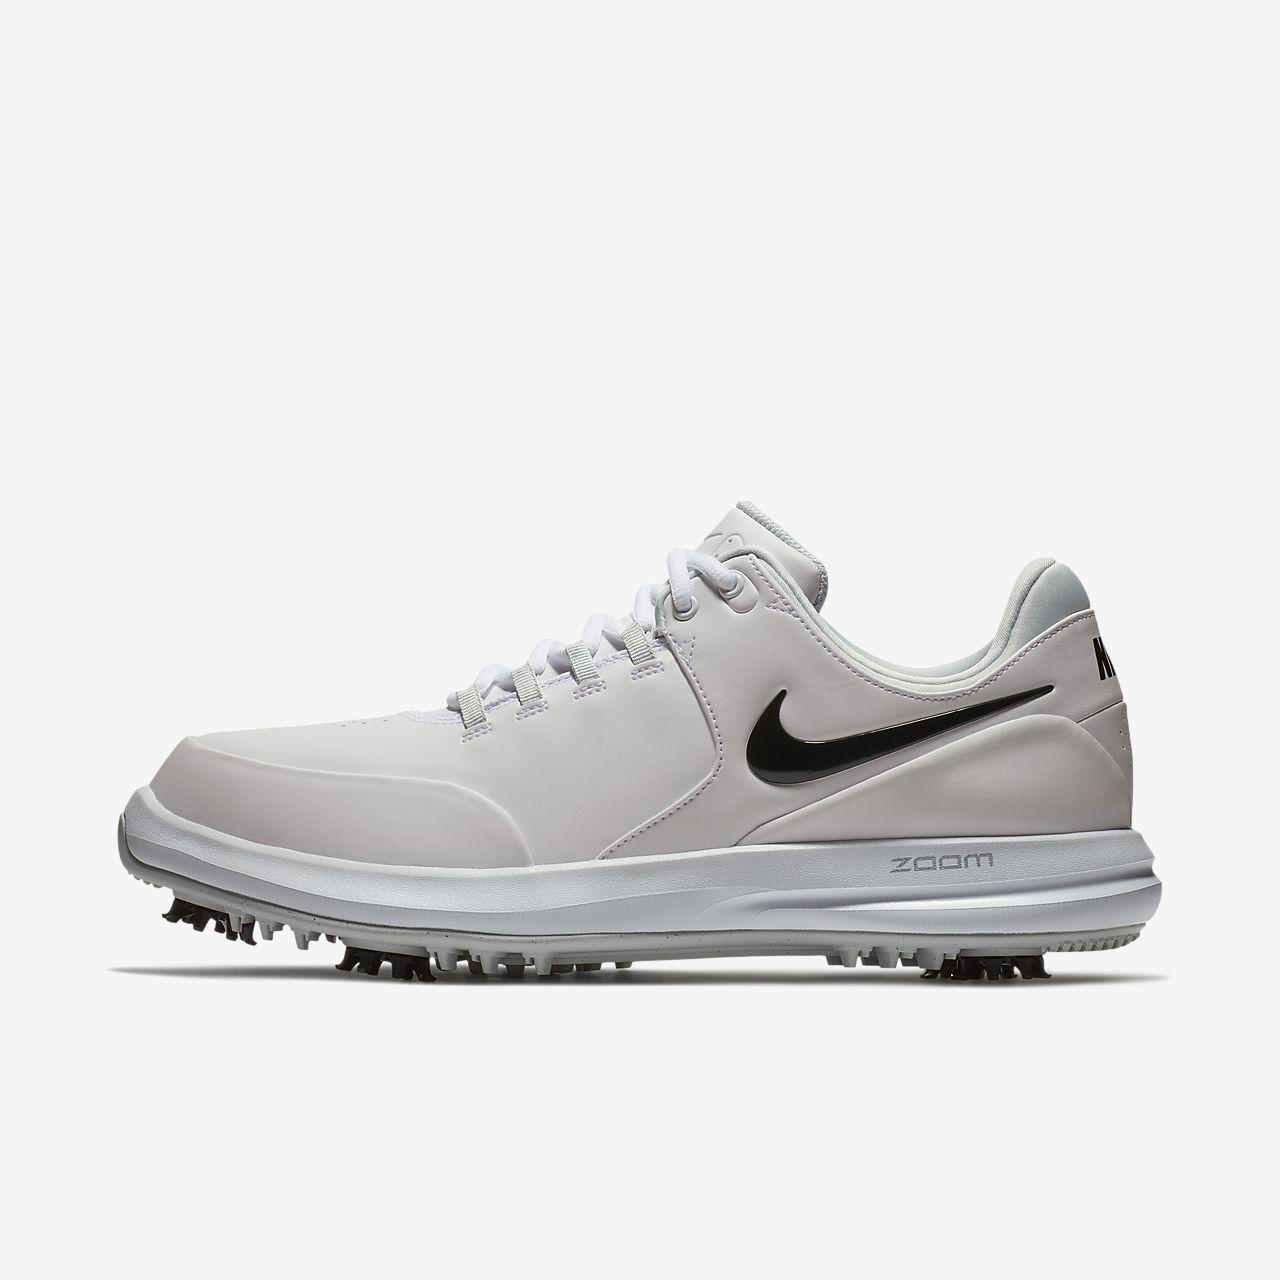 f0ce7cb24fd4 Nike Air Zoom Accurate Men s Golf Shoe. Nike.com NO